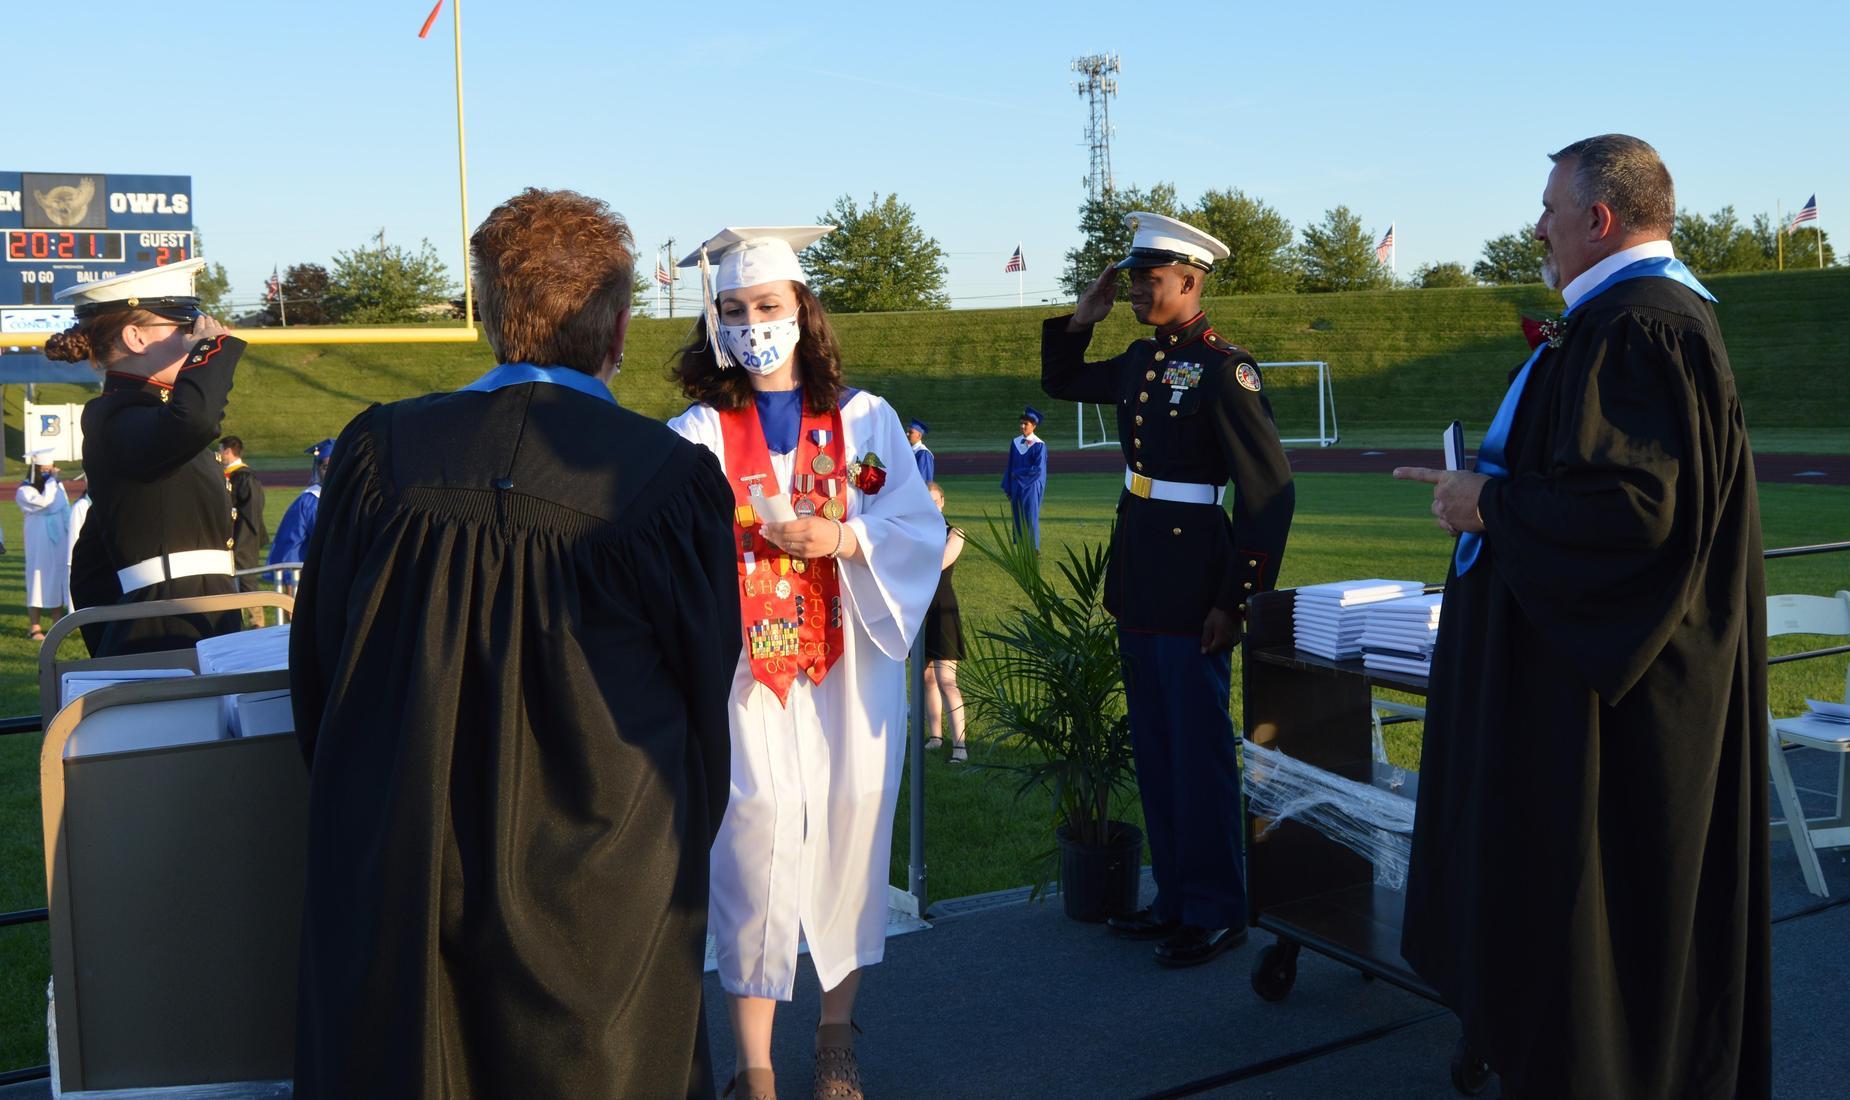 2 Bensalem High School MCJROTC cadets salute BHS senior as she receives her diploma